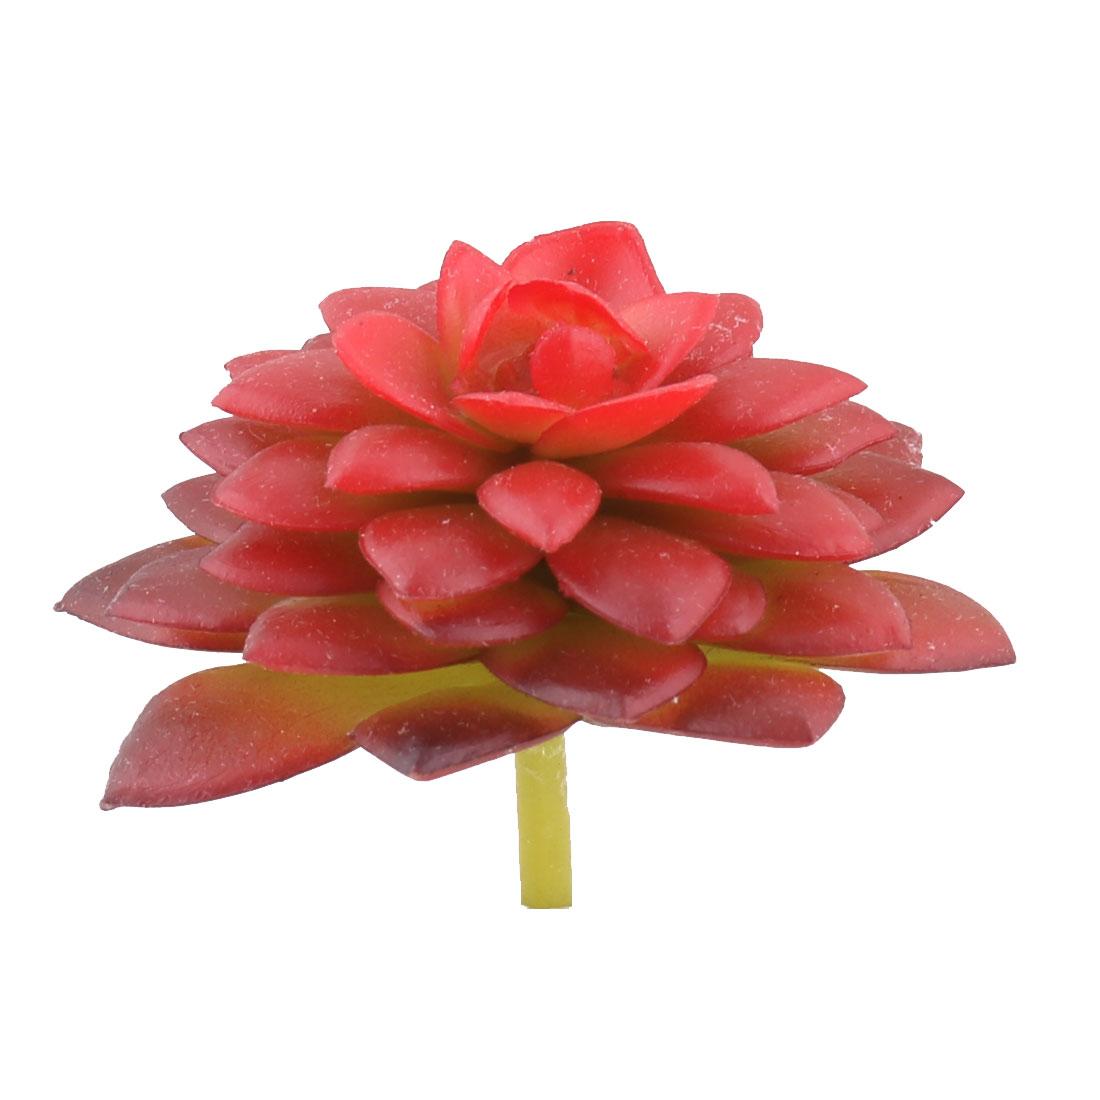 Desktop Plastic DIY Craft Artificial Succulent Plant Ornament Red 2.6 Inches Dia